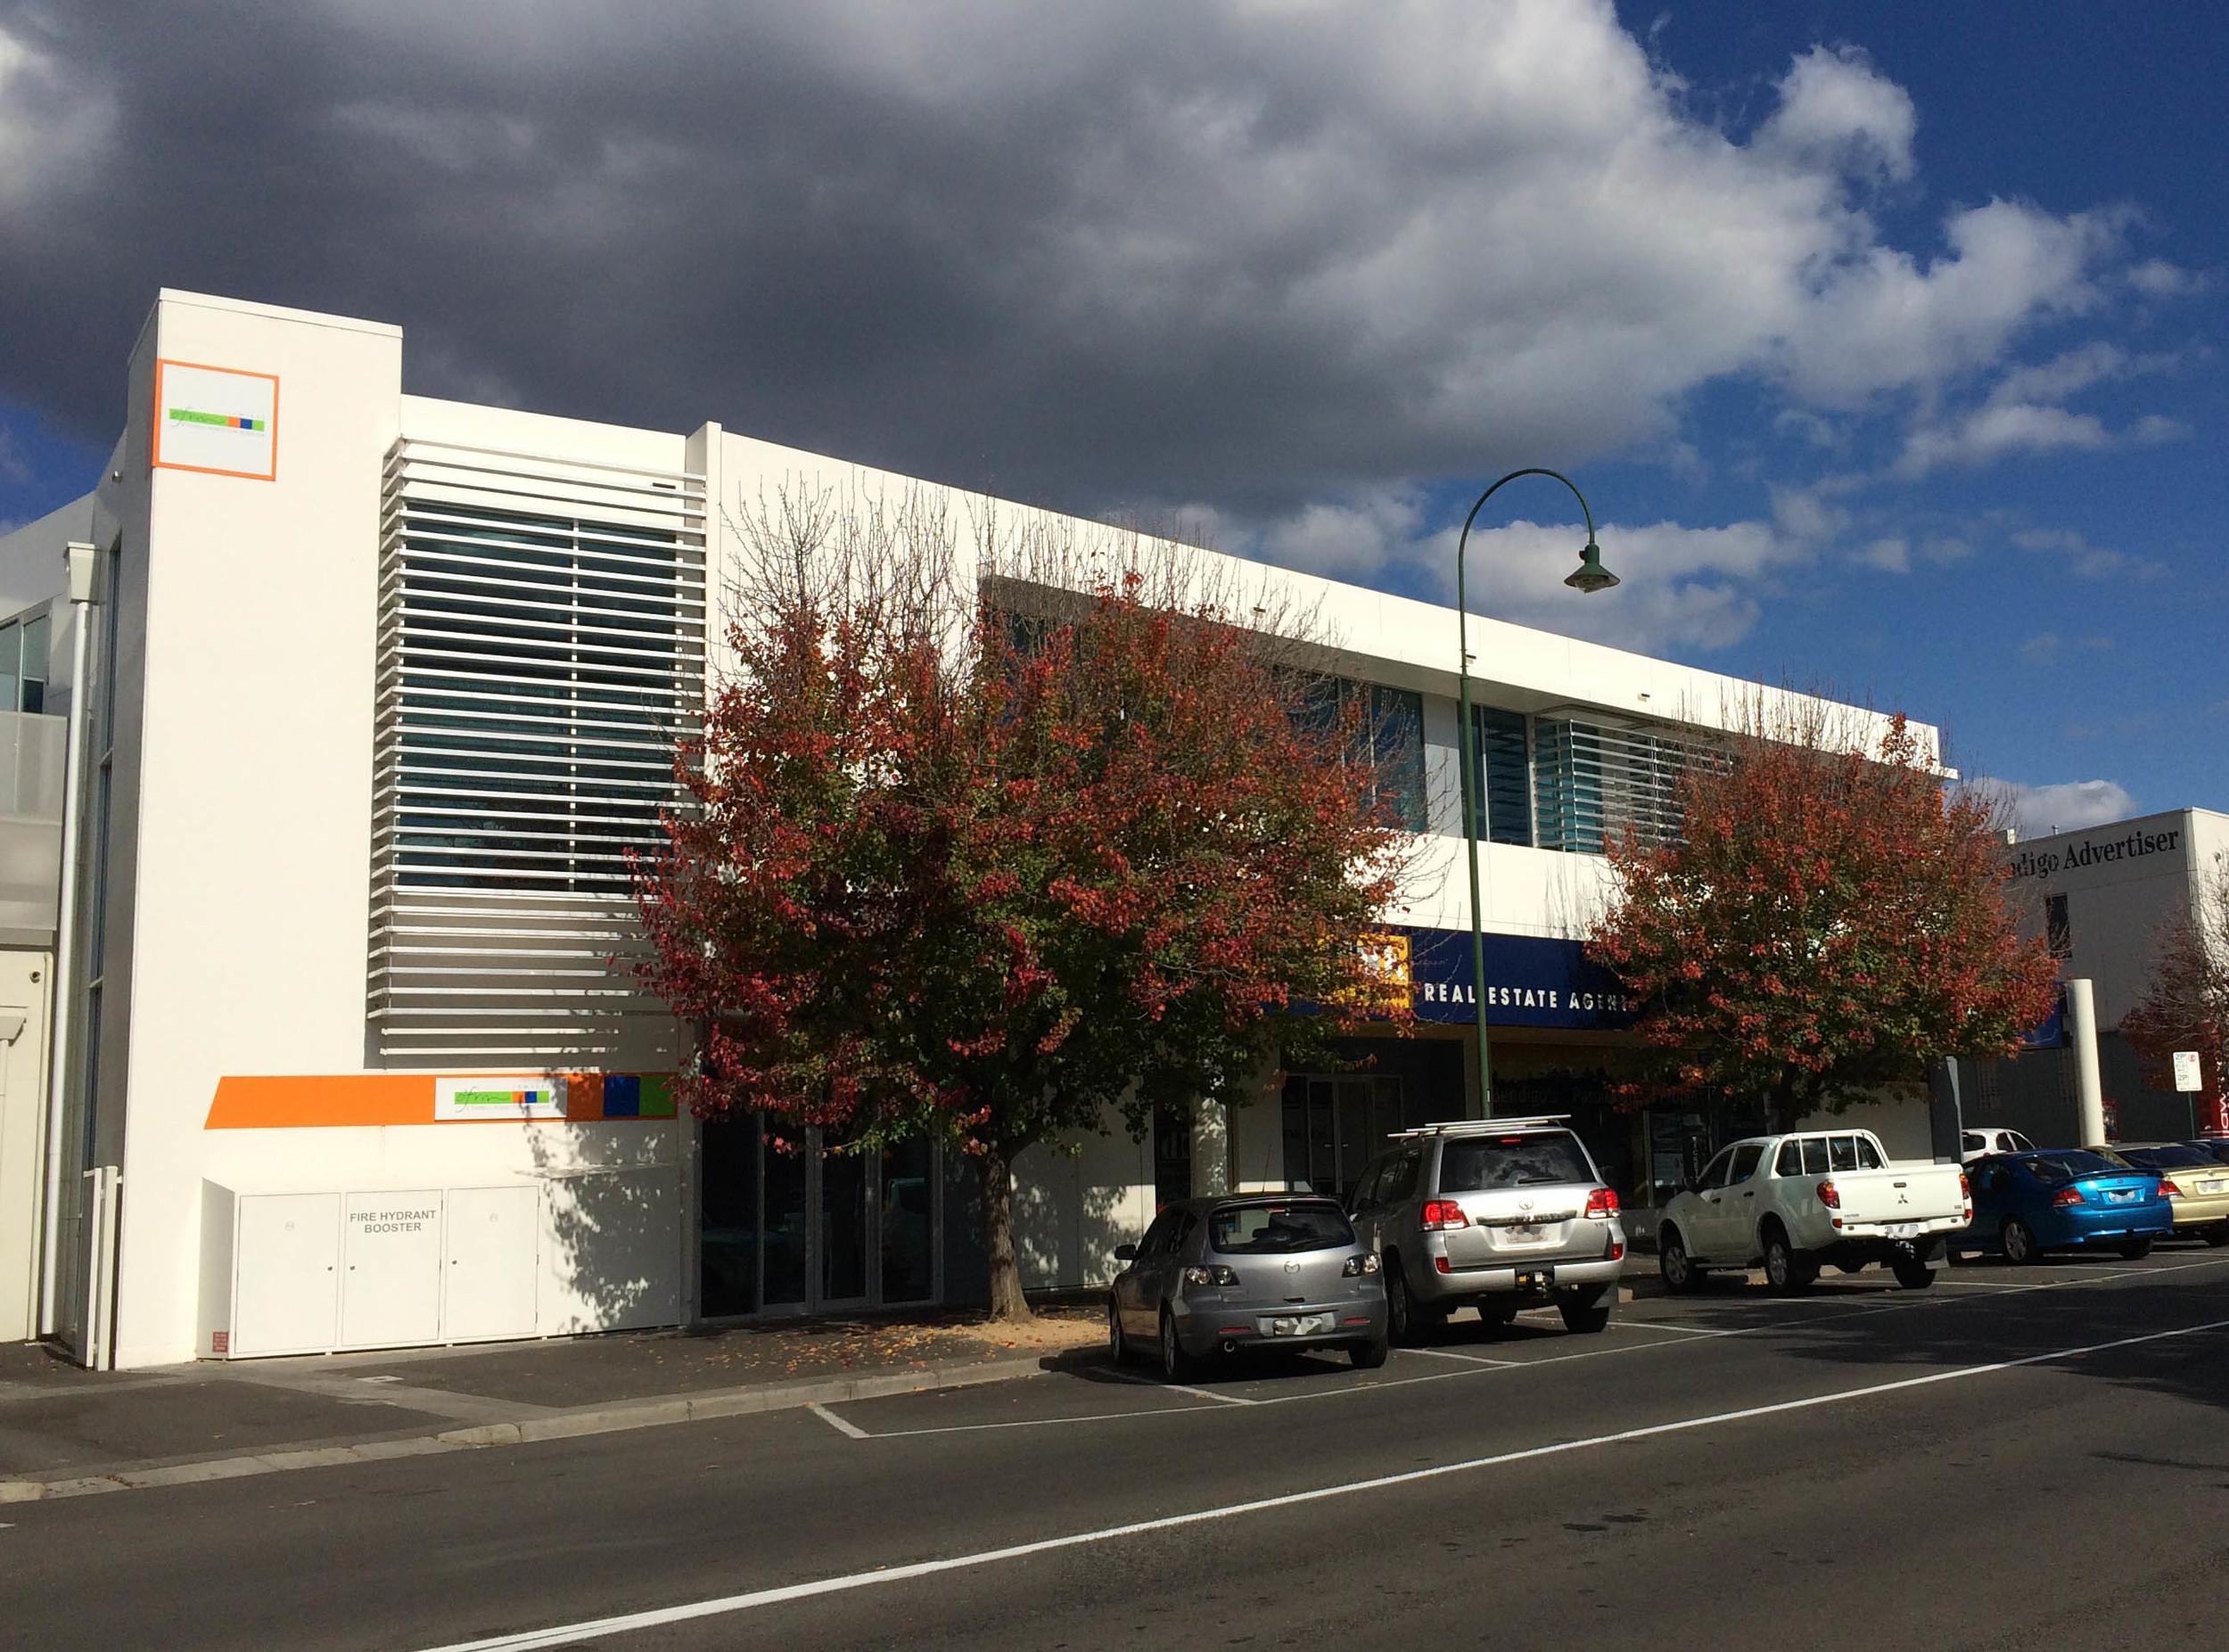 Our building in QUeen Street